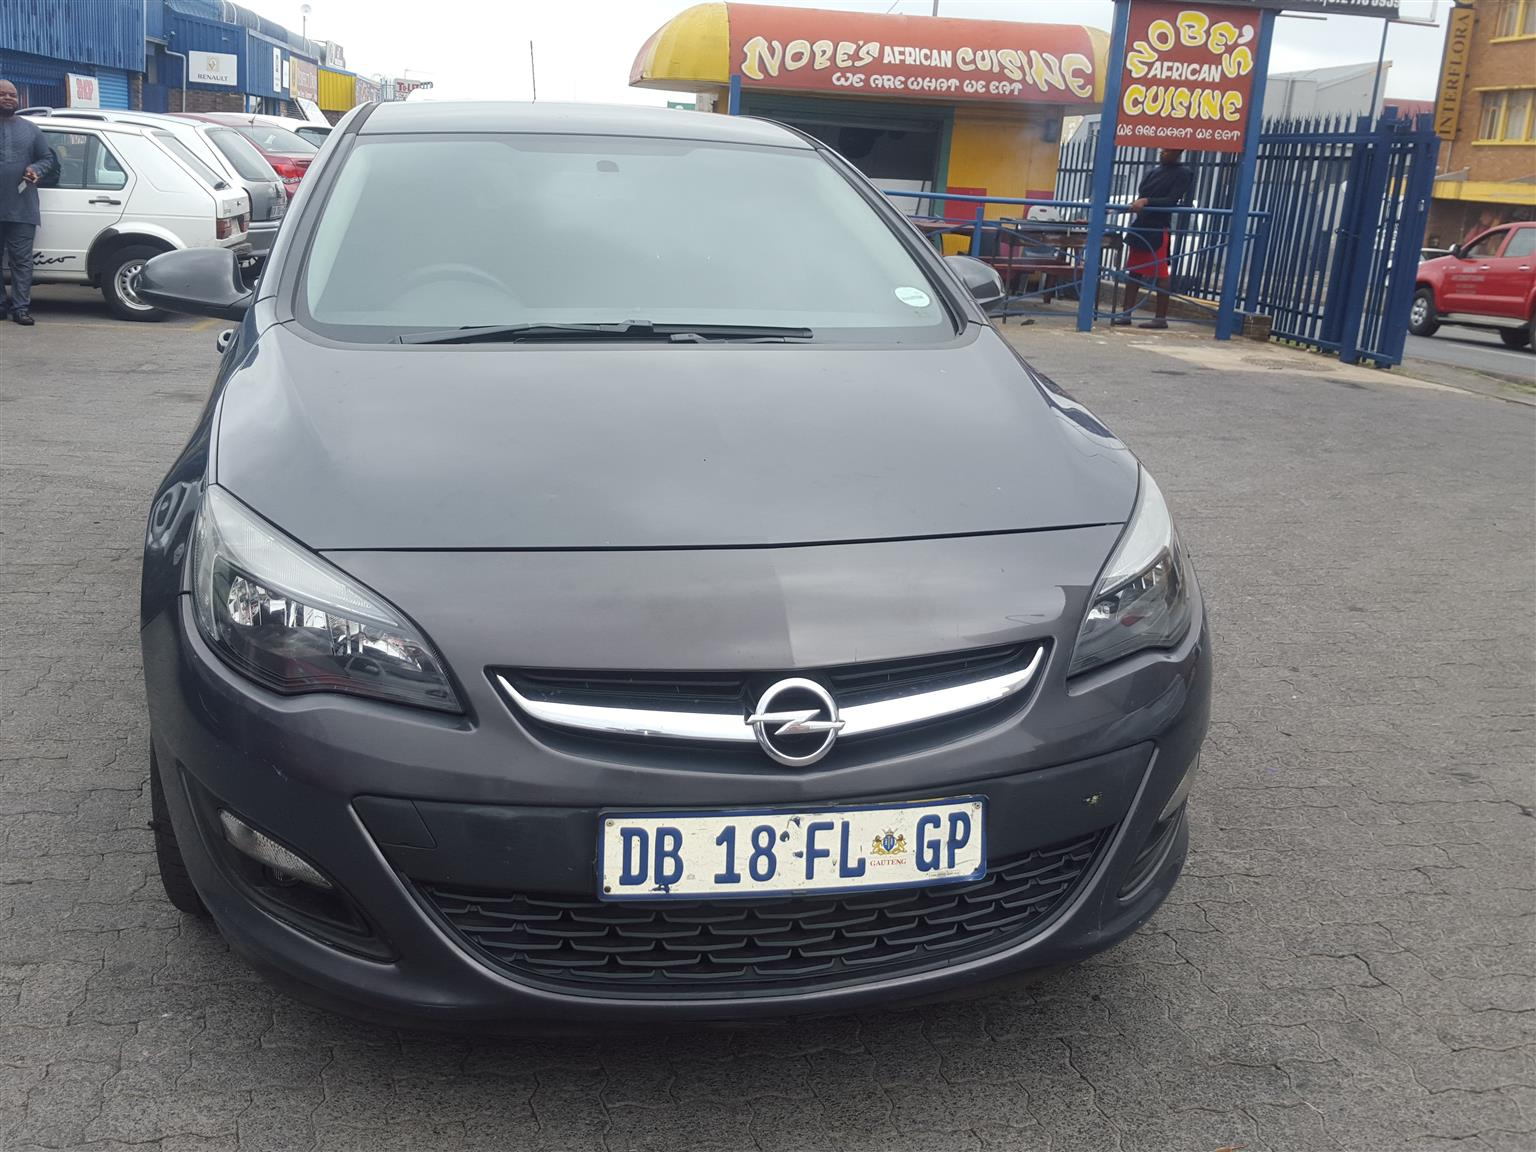 2014 Opel Astra Sedan 1 4 Turbo Enjoy Junk Mail